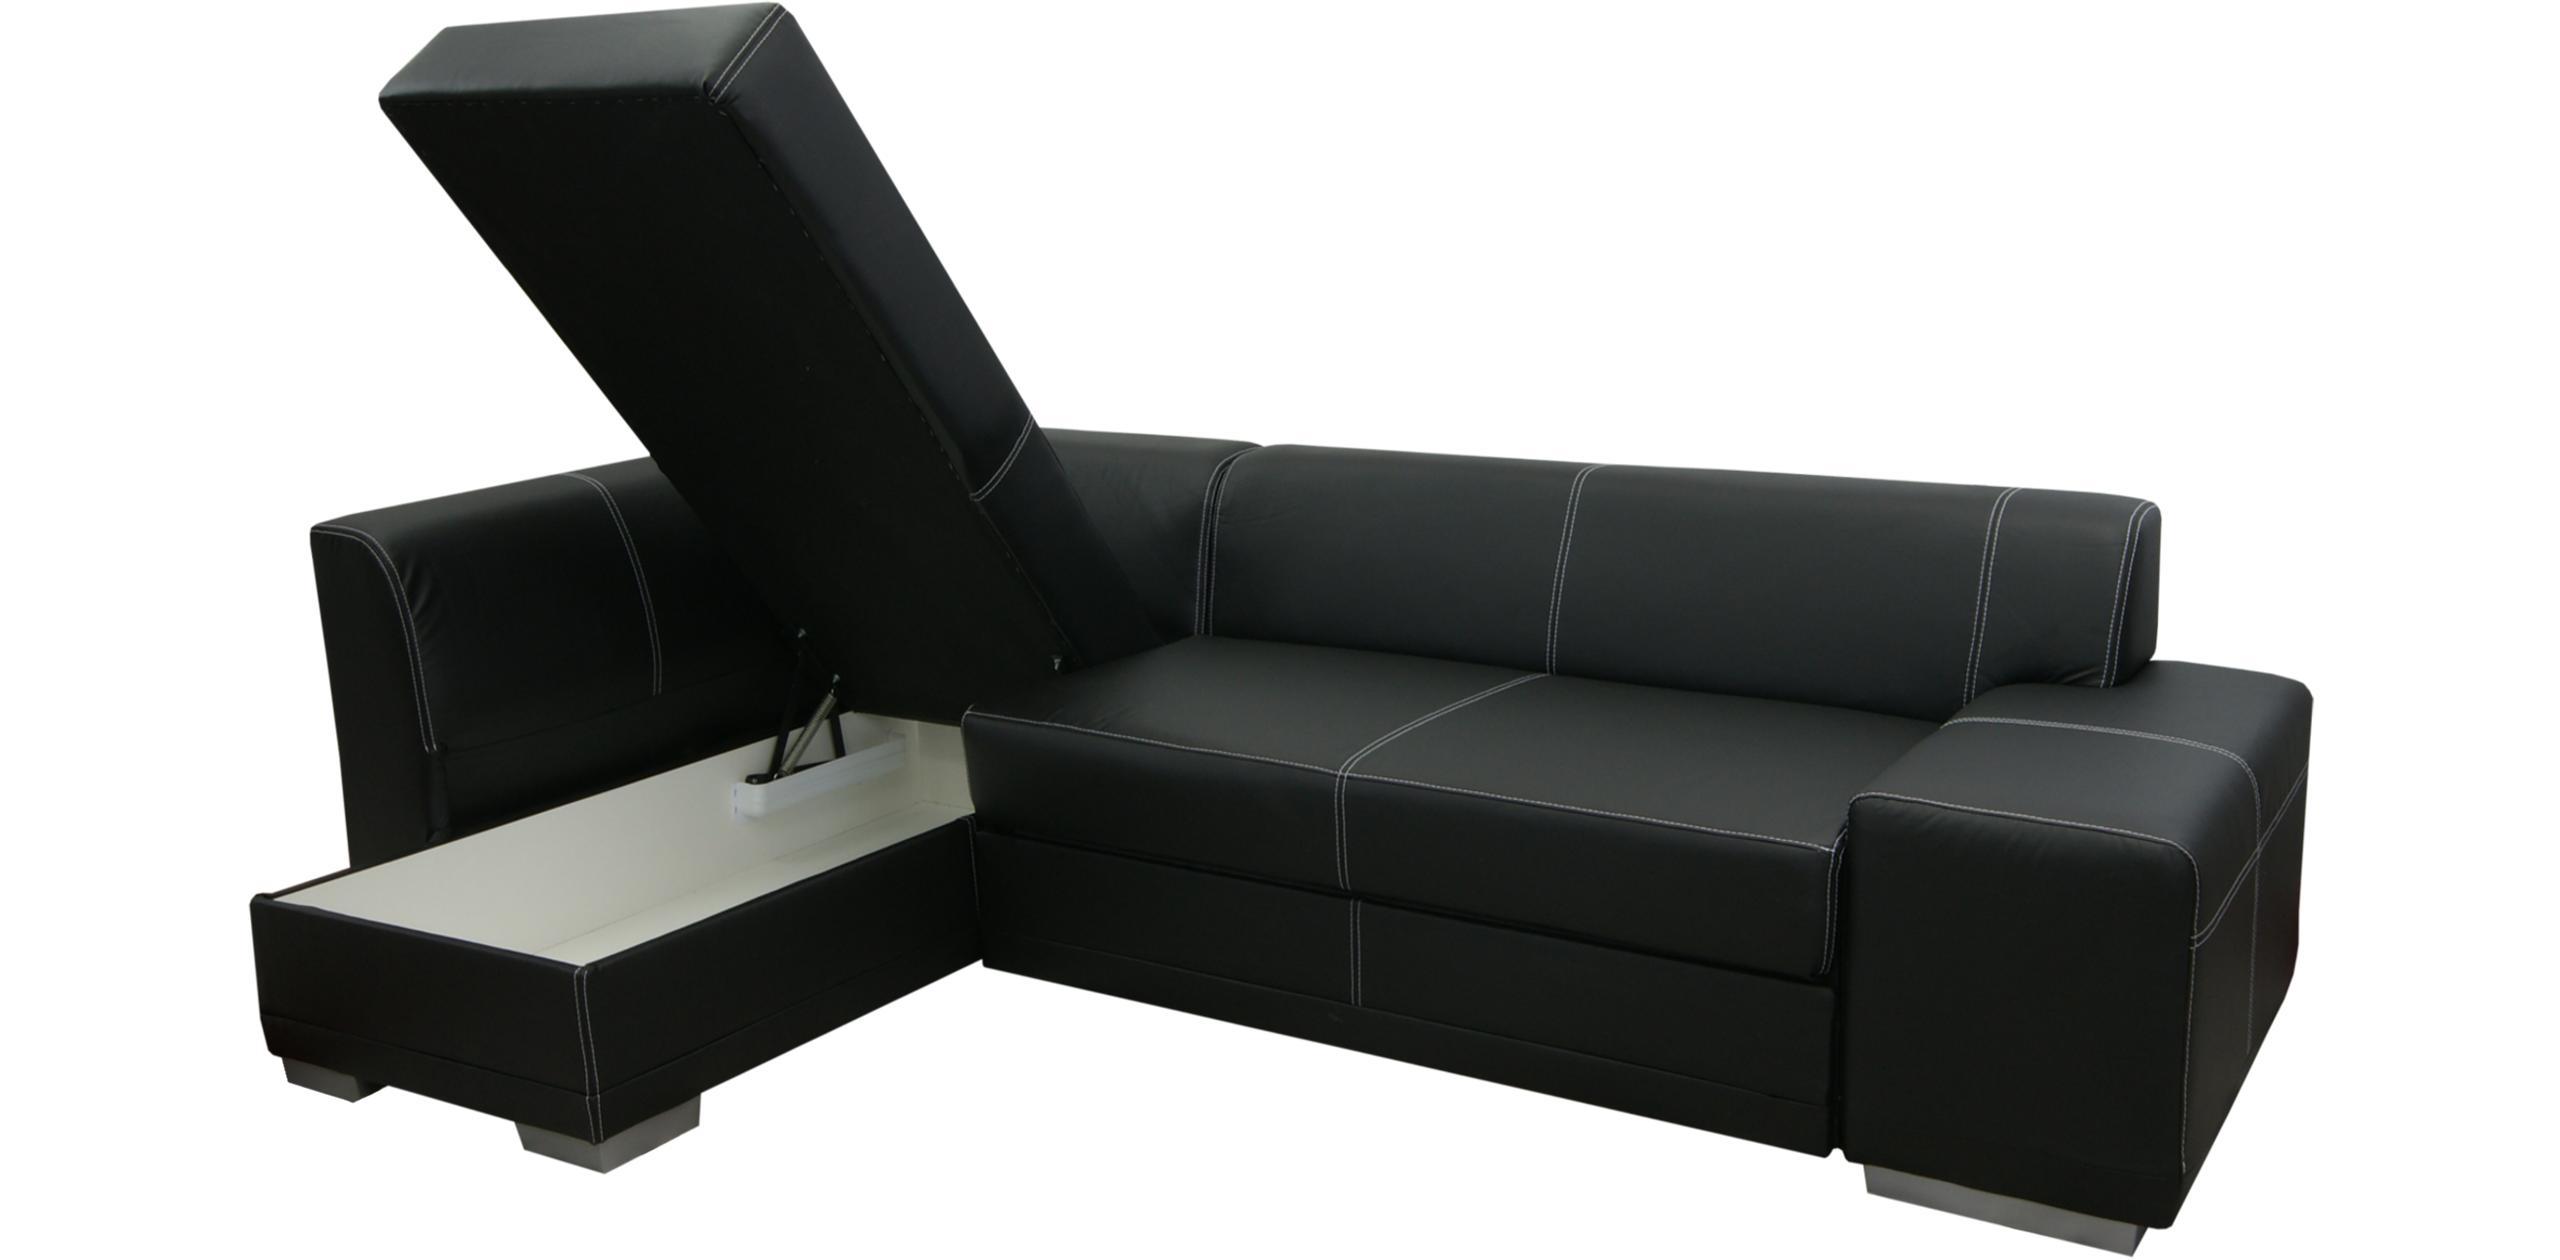 2nd hand sectional sofa cream sofas 20 best cheap corner beds ideas